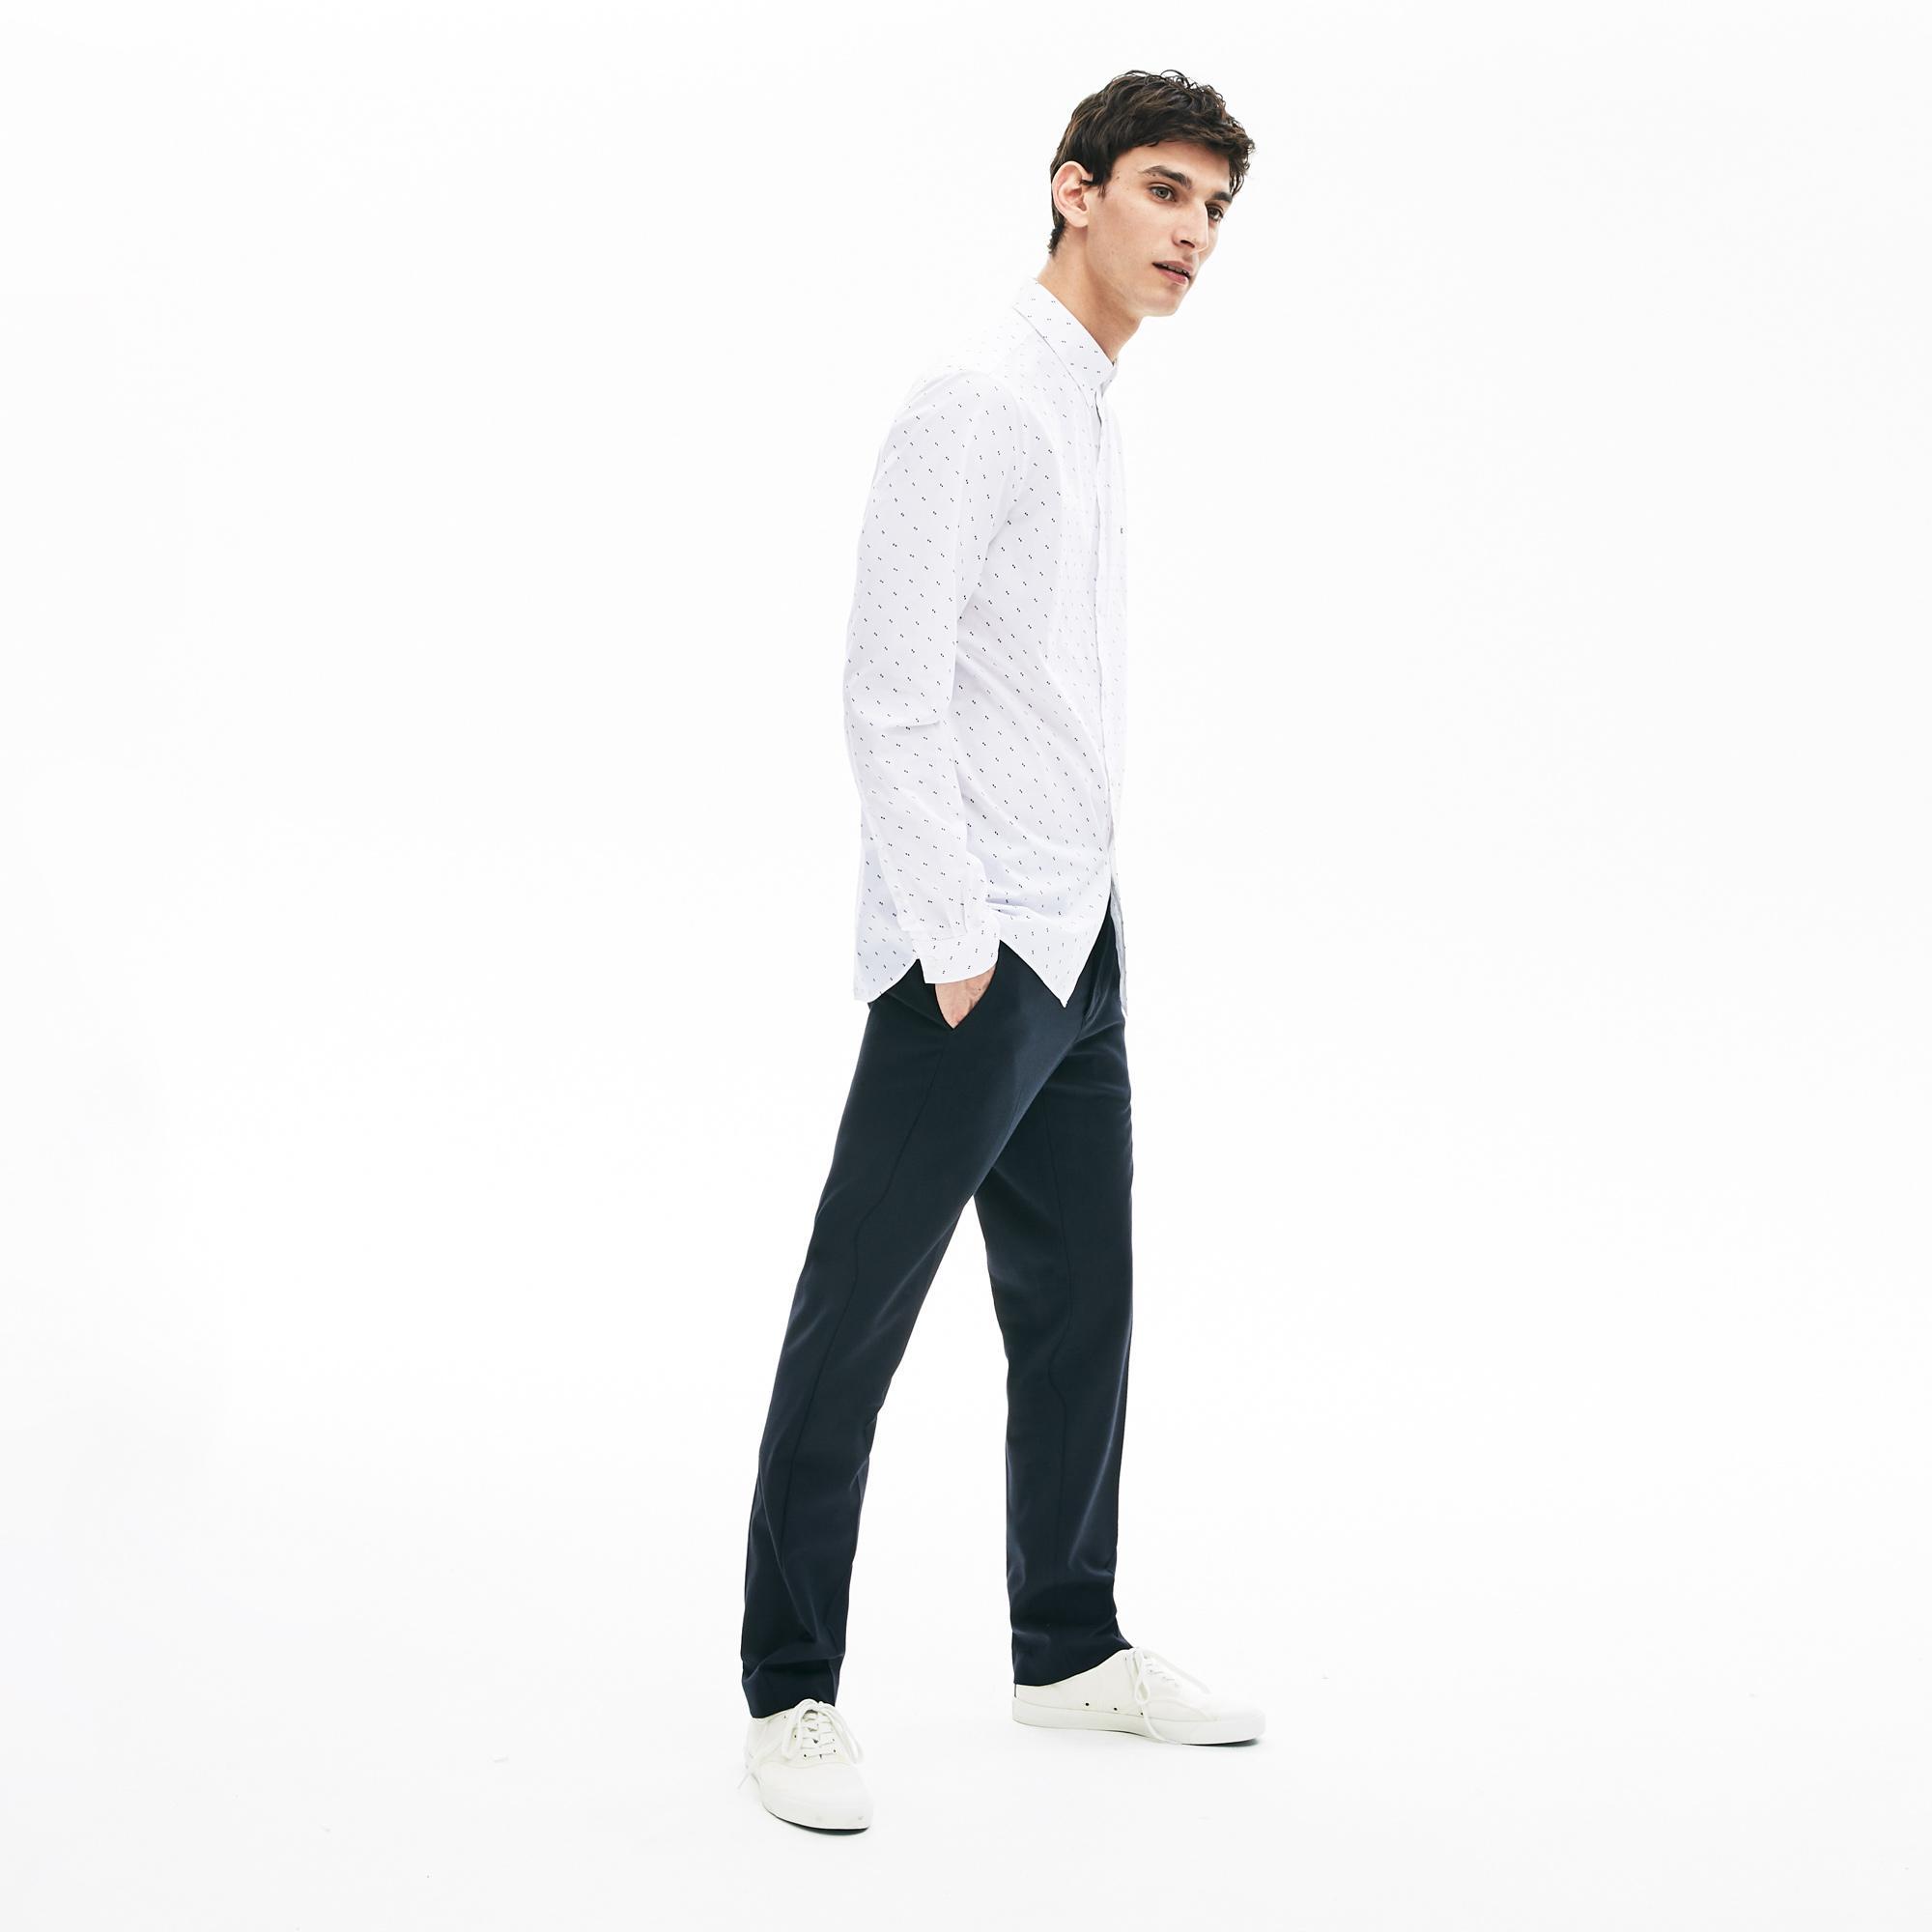 Lacoste Men's Printed Cotton Poplin Shirt